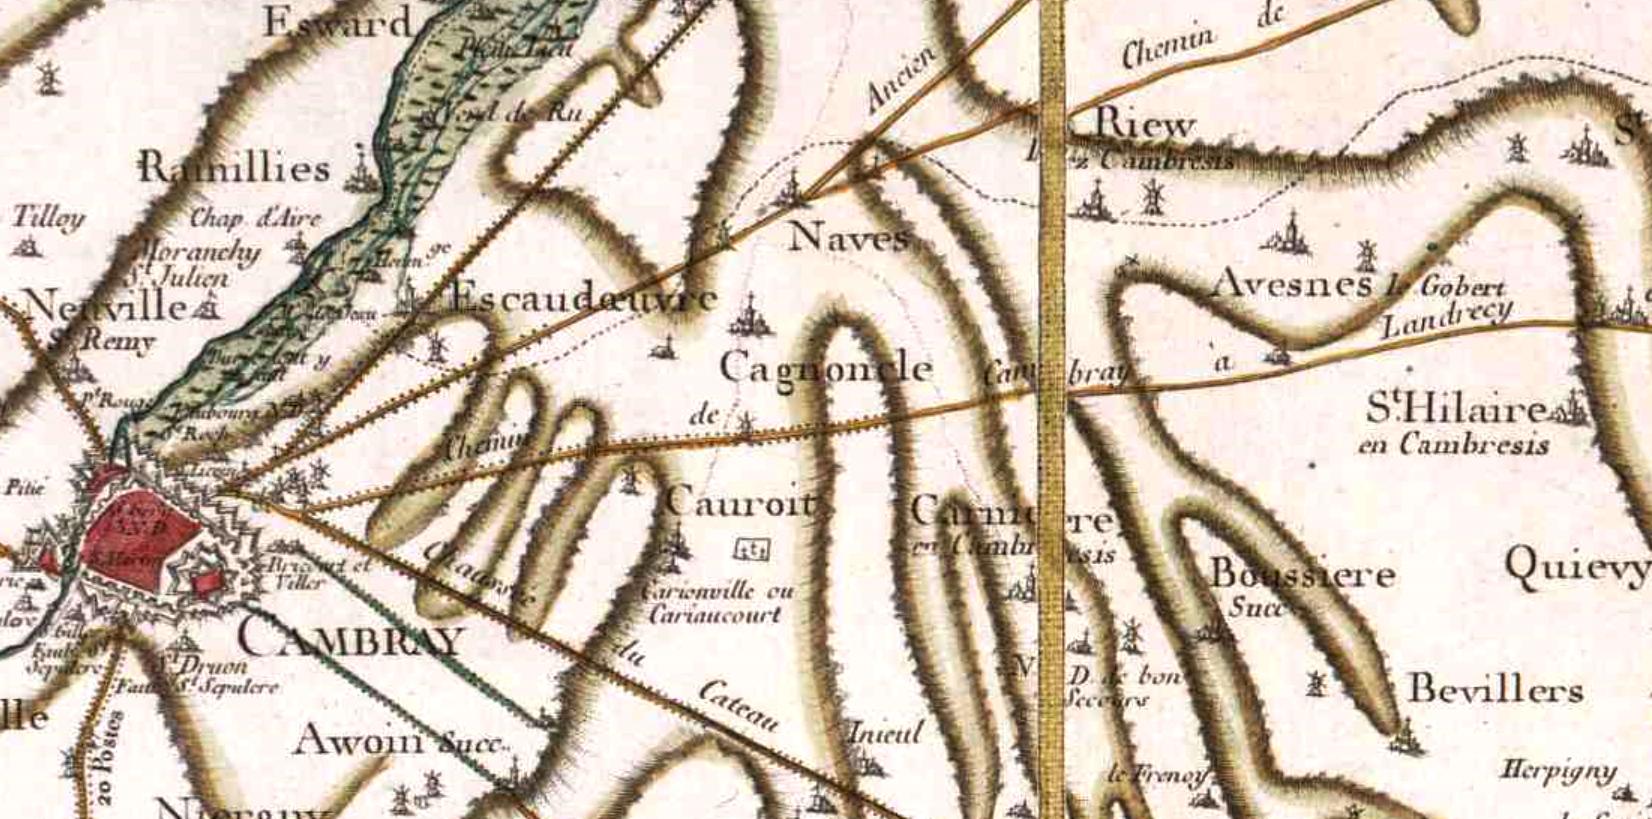 Cagnoncles 59 cassini